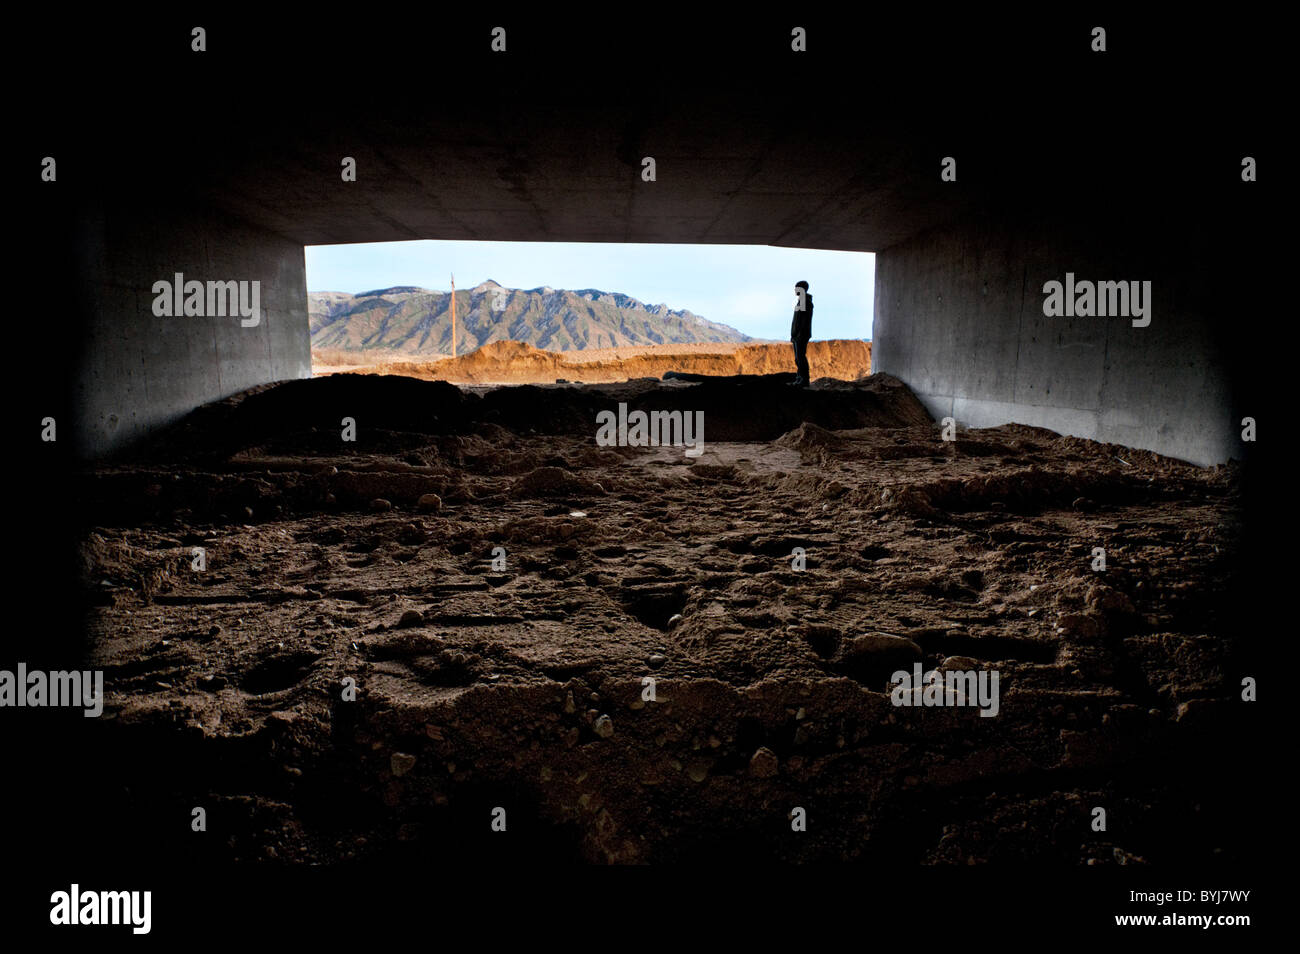 Mann steht am Eingang zum dunklen tunnel Stockbild